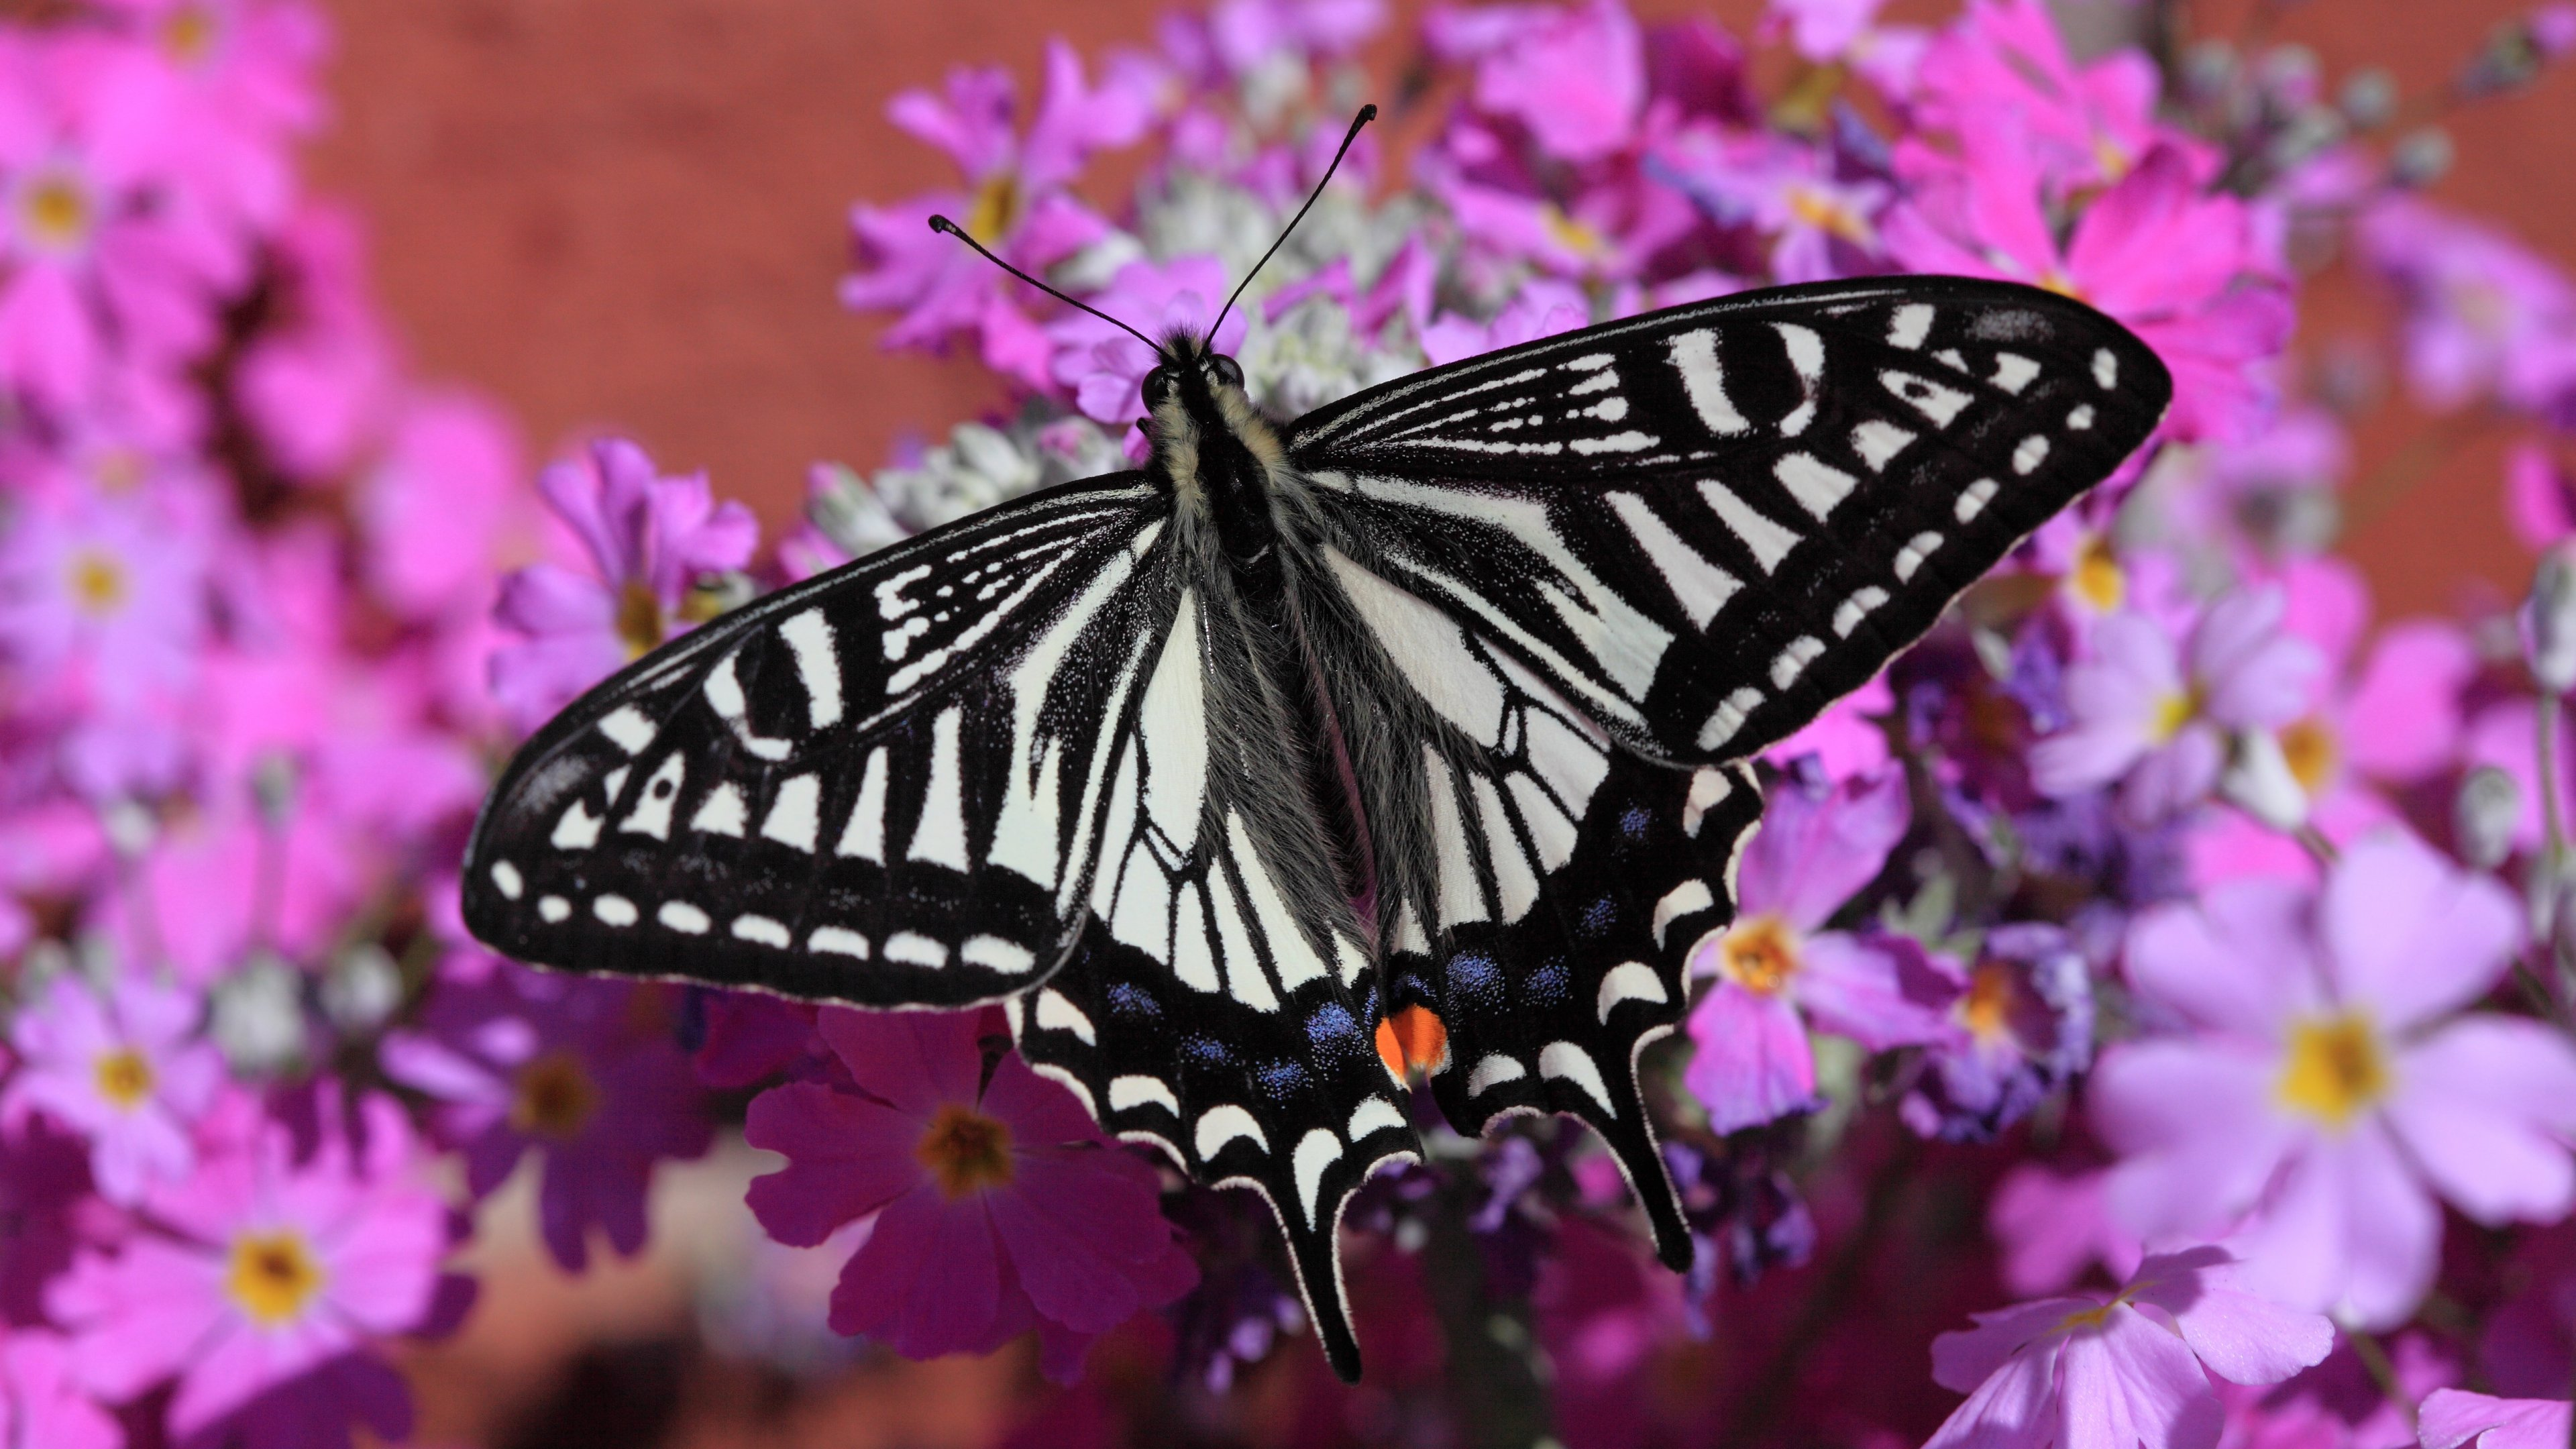 Swallowtail Butterfly Wallpaper